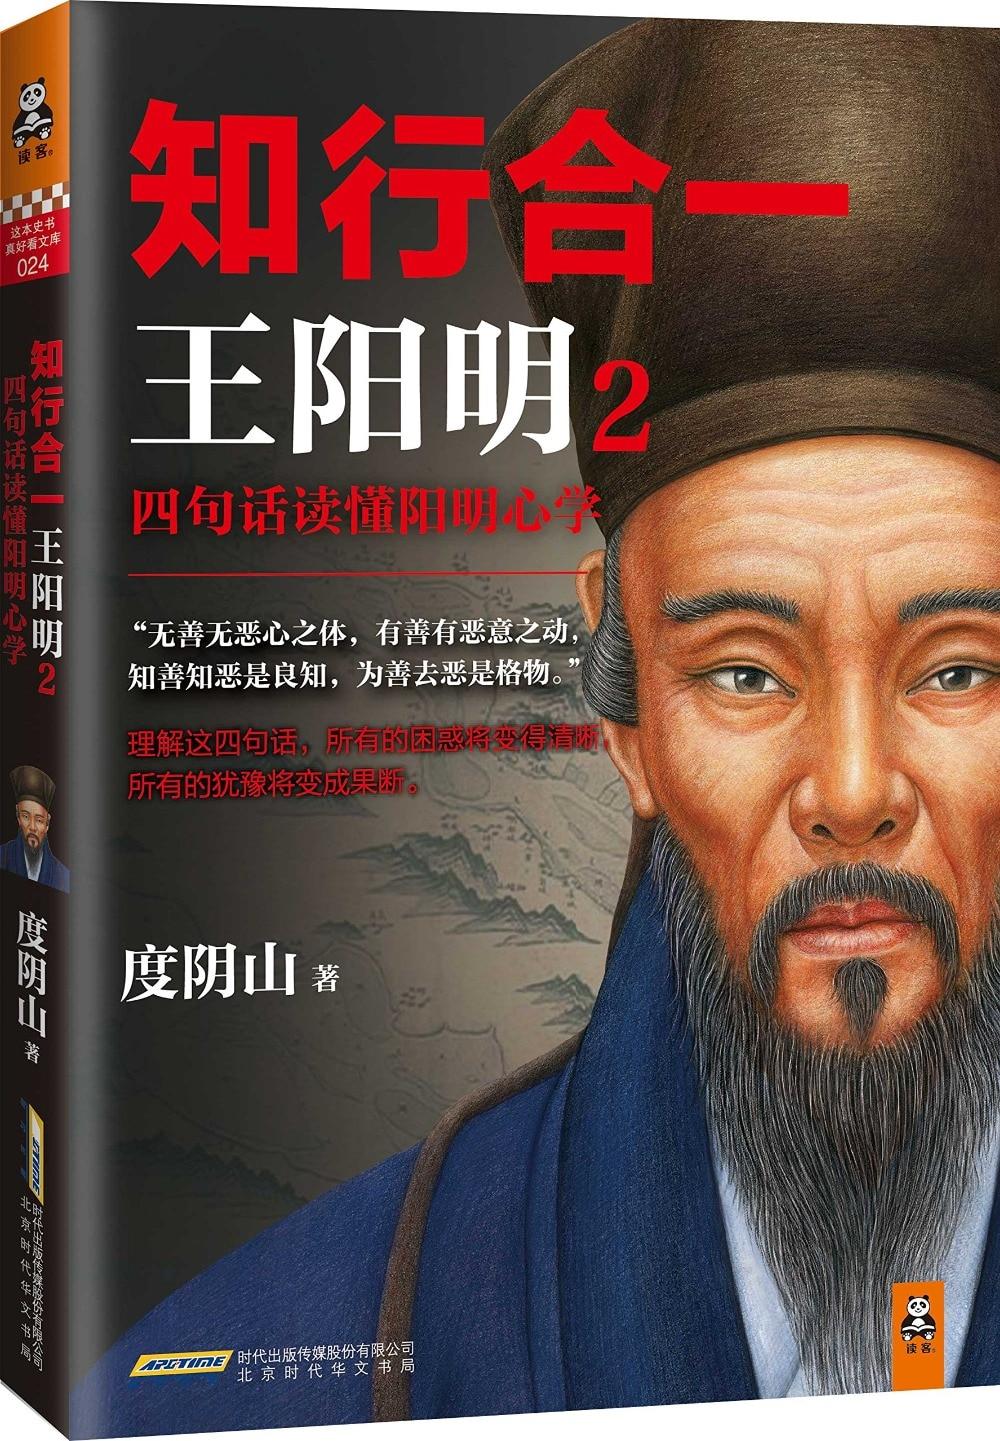 Wang Yangming Biography Book : Four Words Read Yangmingxinxue Learning Chinese Traditional Wisdom Book